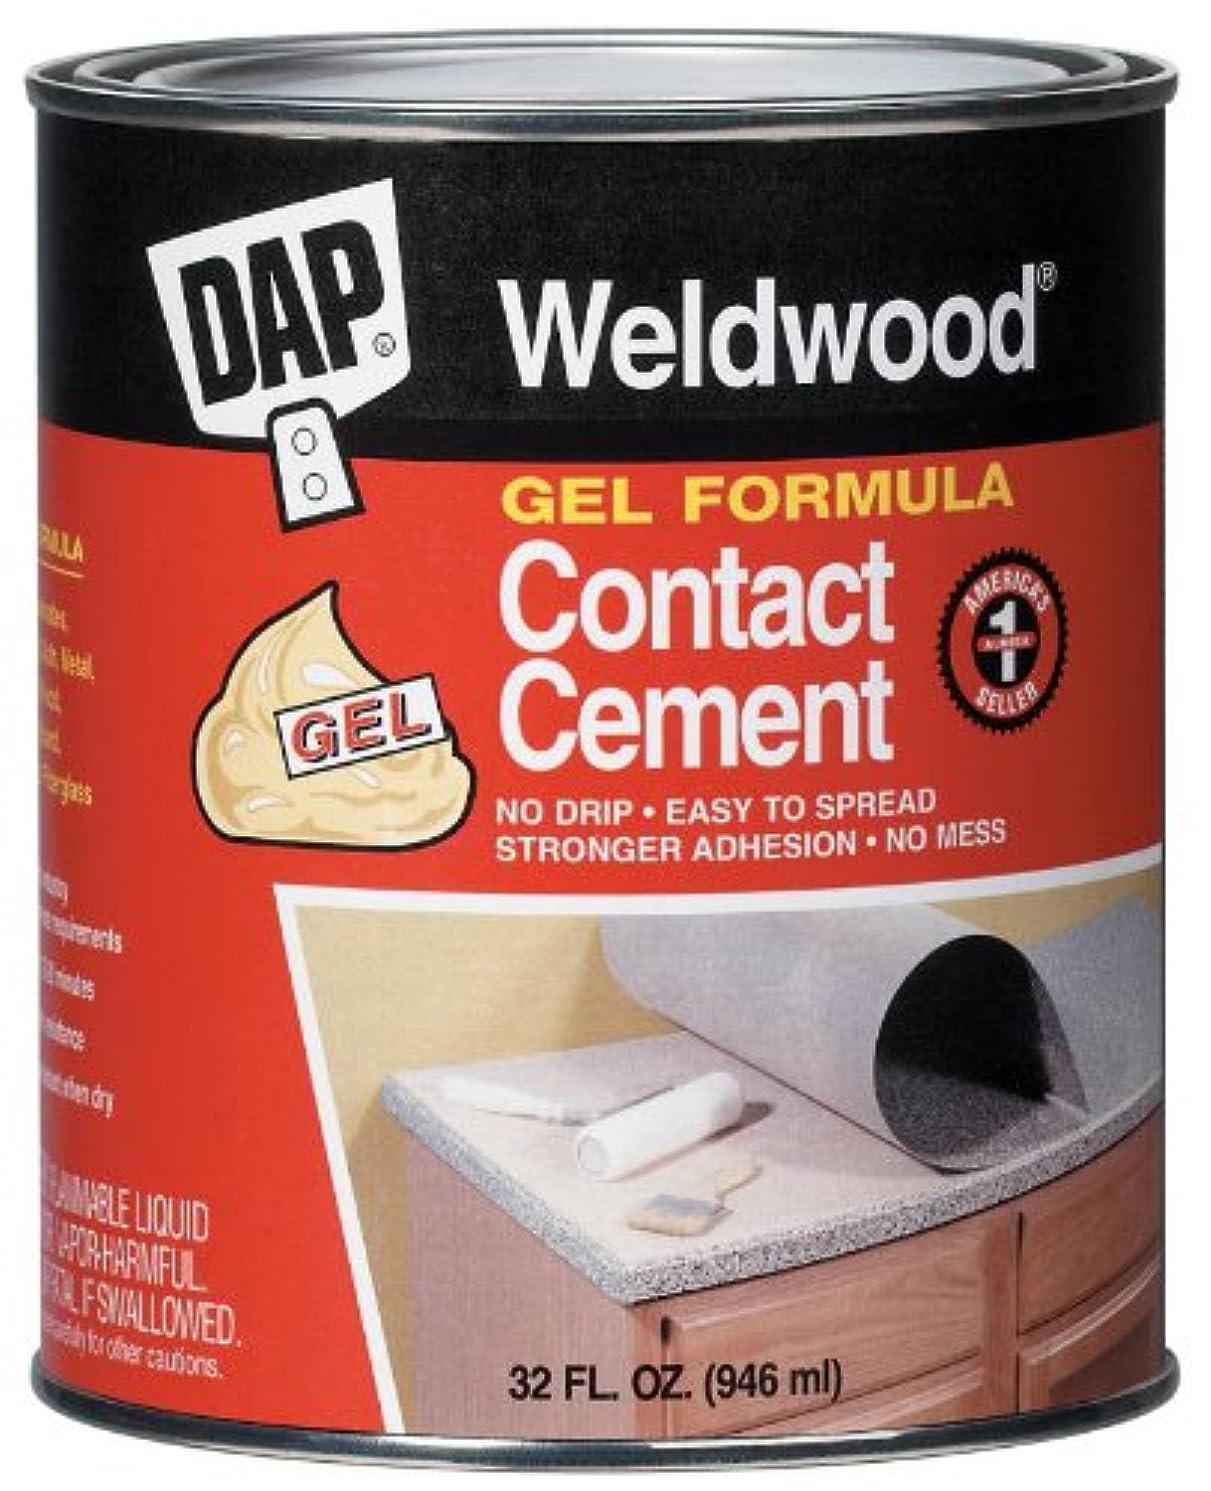 Dap 25312 Weldwood Contact Cement Gel Formula 1-Quart, Model: 25312, Outdoor & Hardware Store